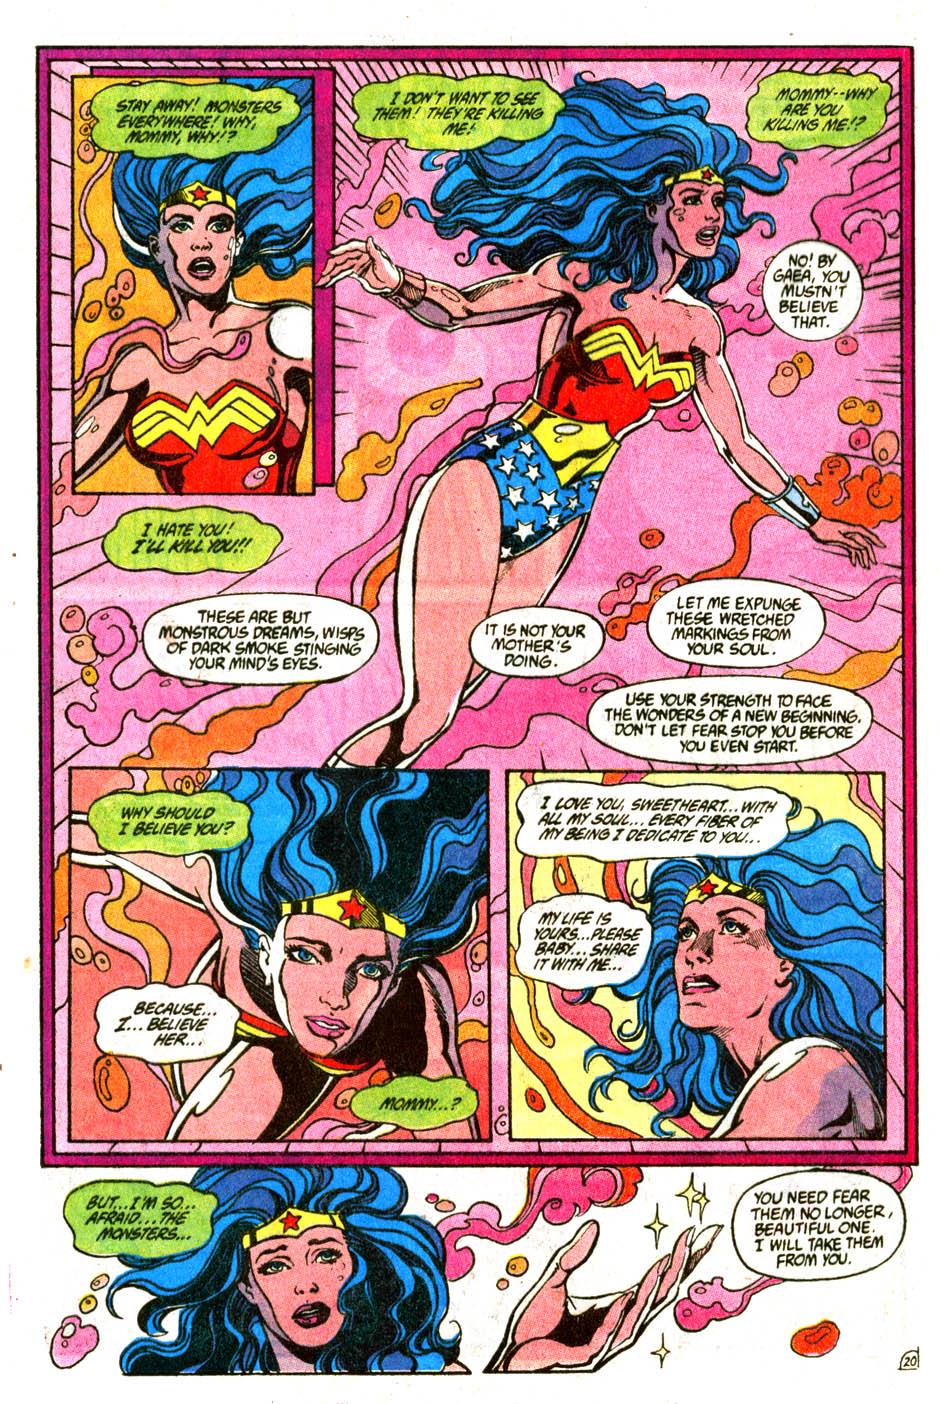 Read online Wonder Woman (1987) comic -  Issue #56 - 22